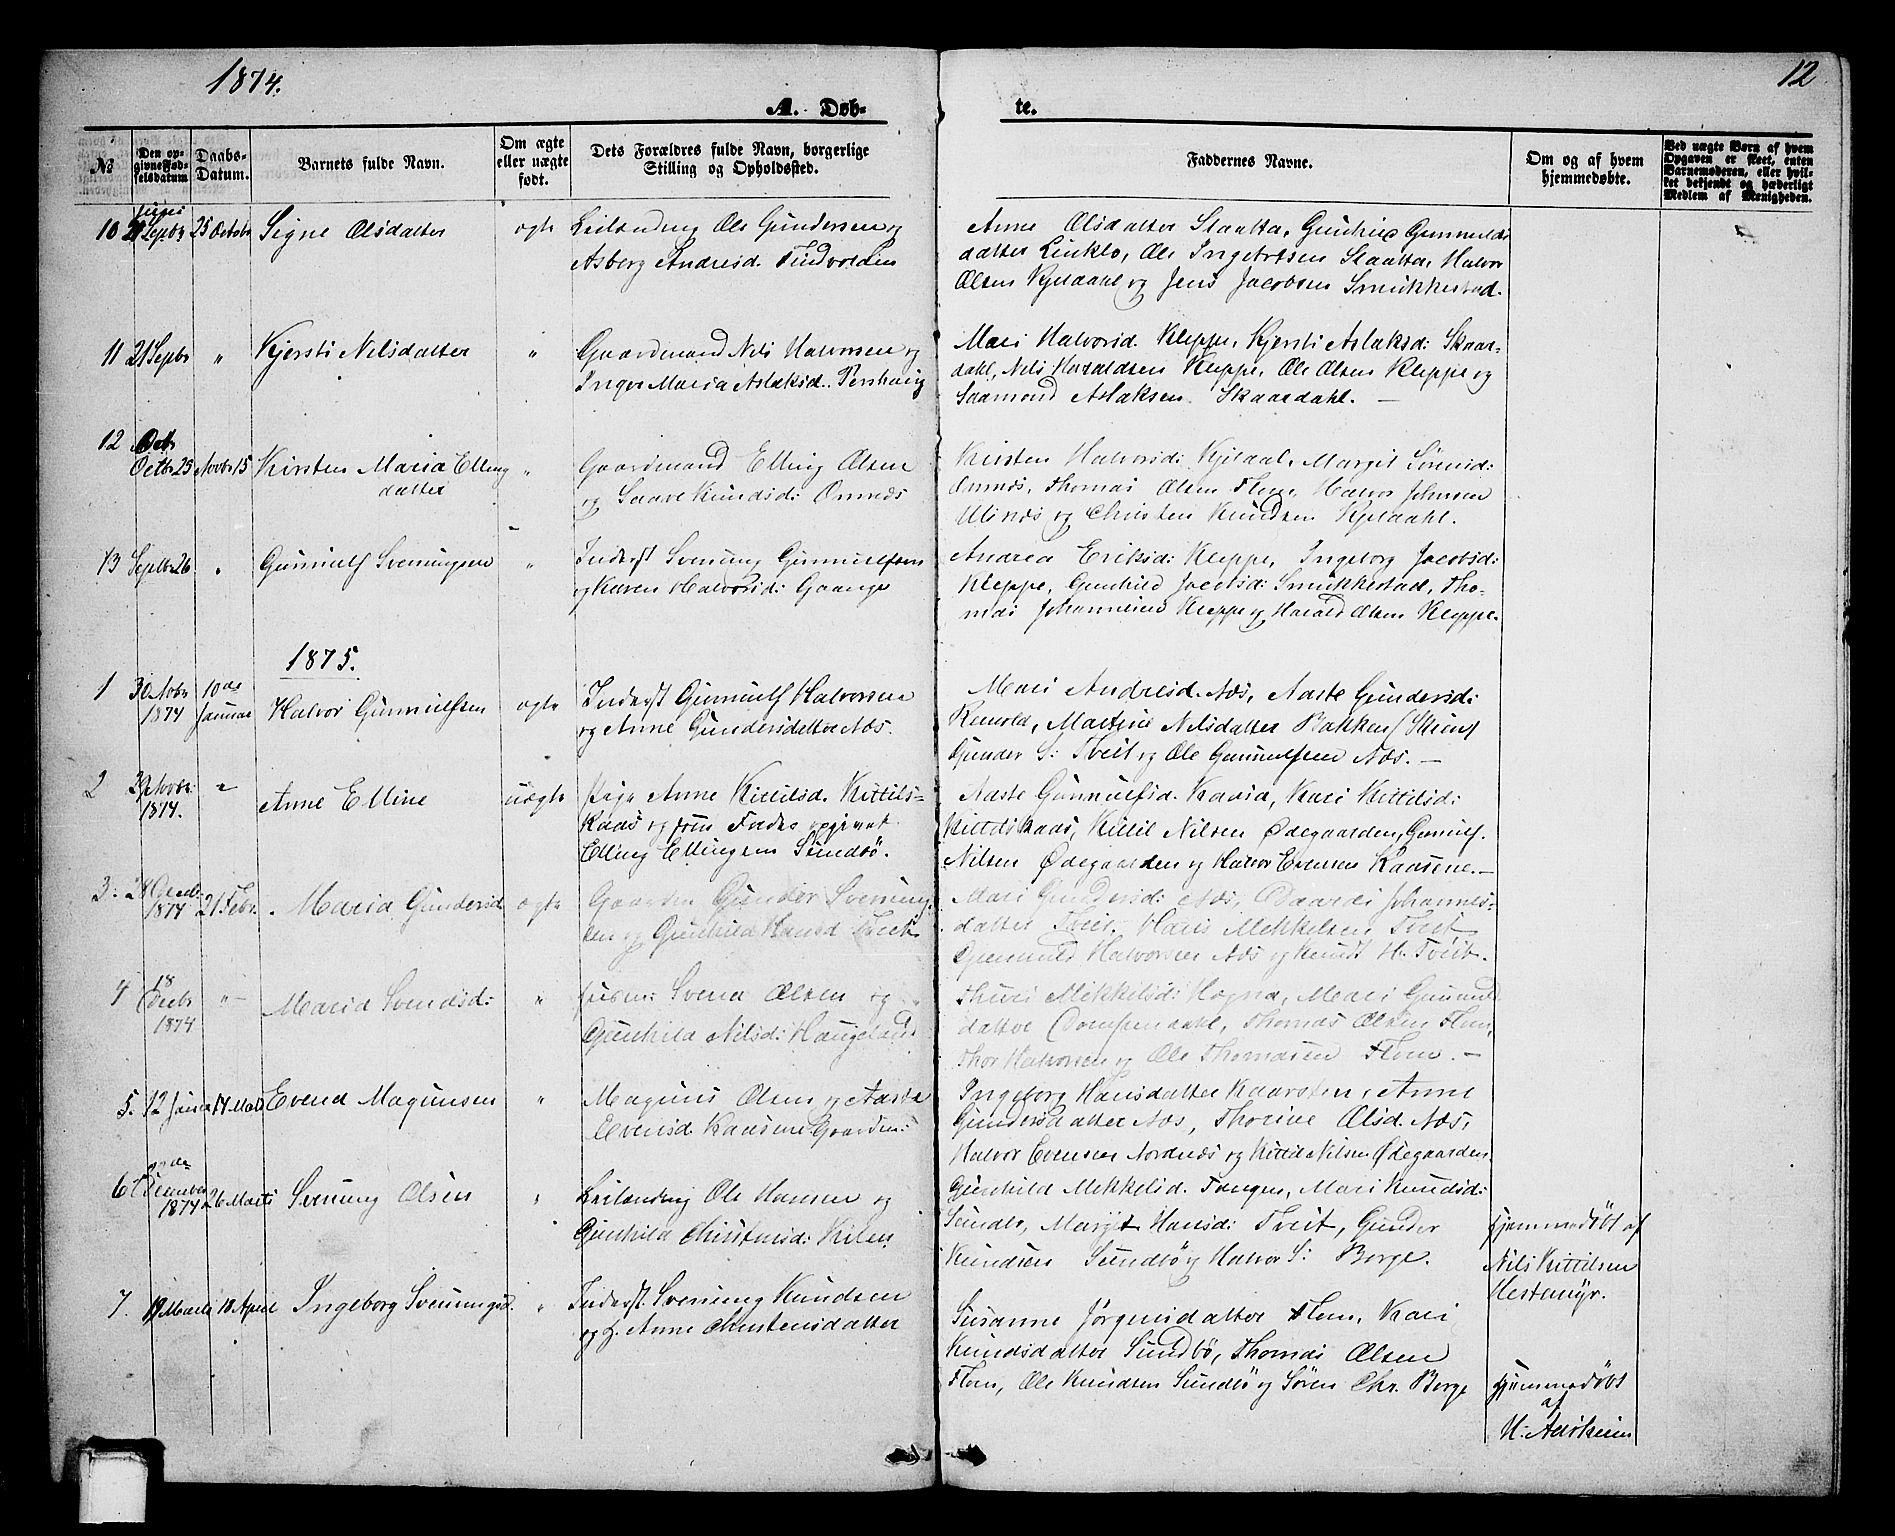 SAKO, Lunde kirkebøker, G/Gb/L0001: Klokkerbok nr. II 1, 1866-1887, s. 12